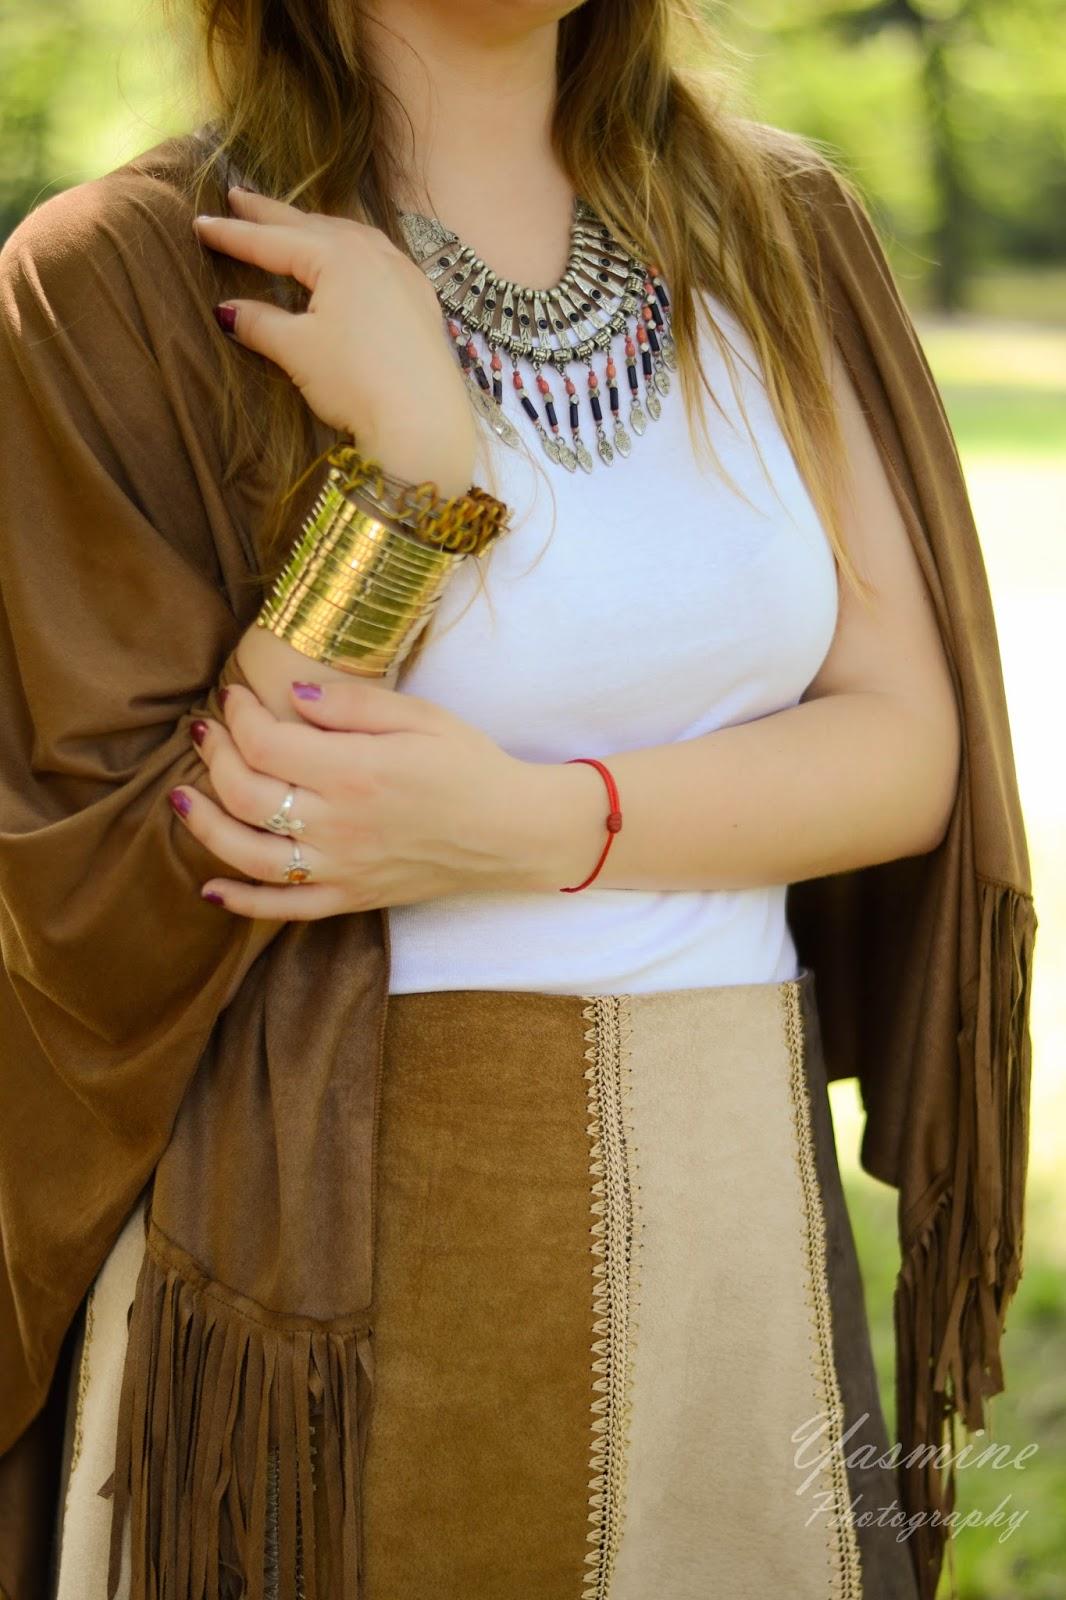 8 coachella boho style etno summer sommer festival indie jewellery stylizacja na festiwal festival coachella poland polish blogger sommer summer style fashion moda inspiration melodylaniella gold